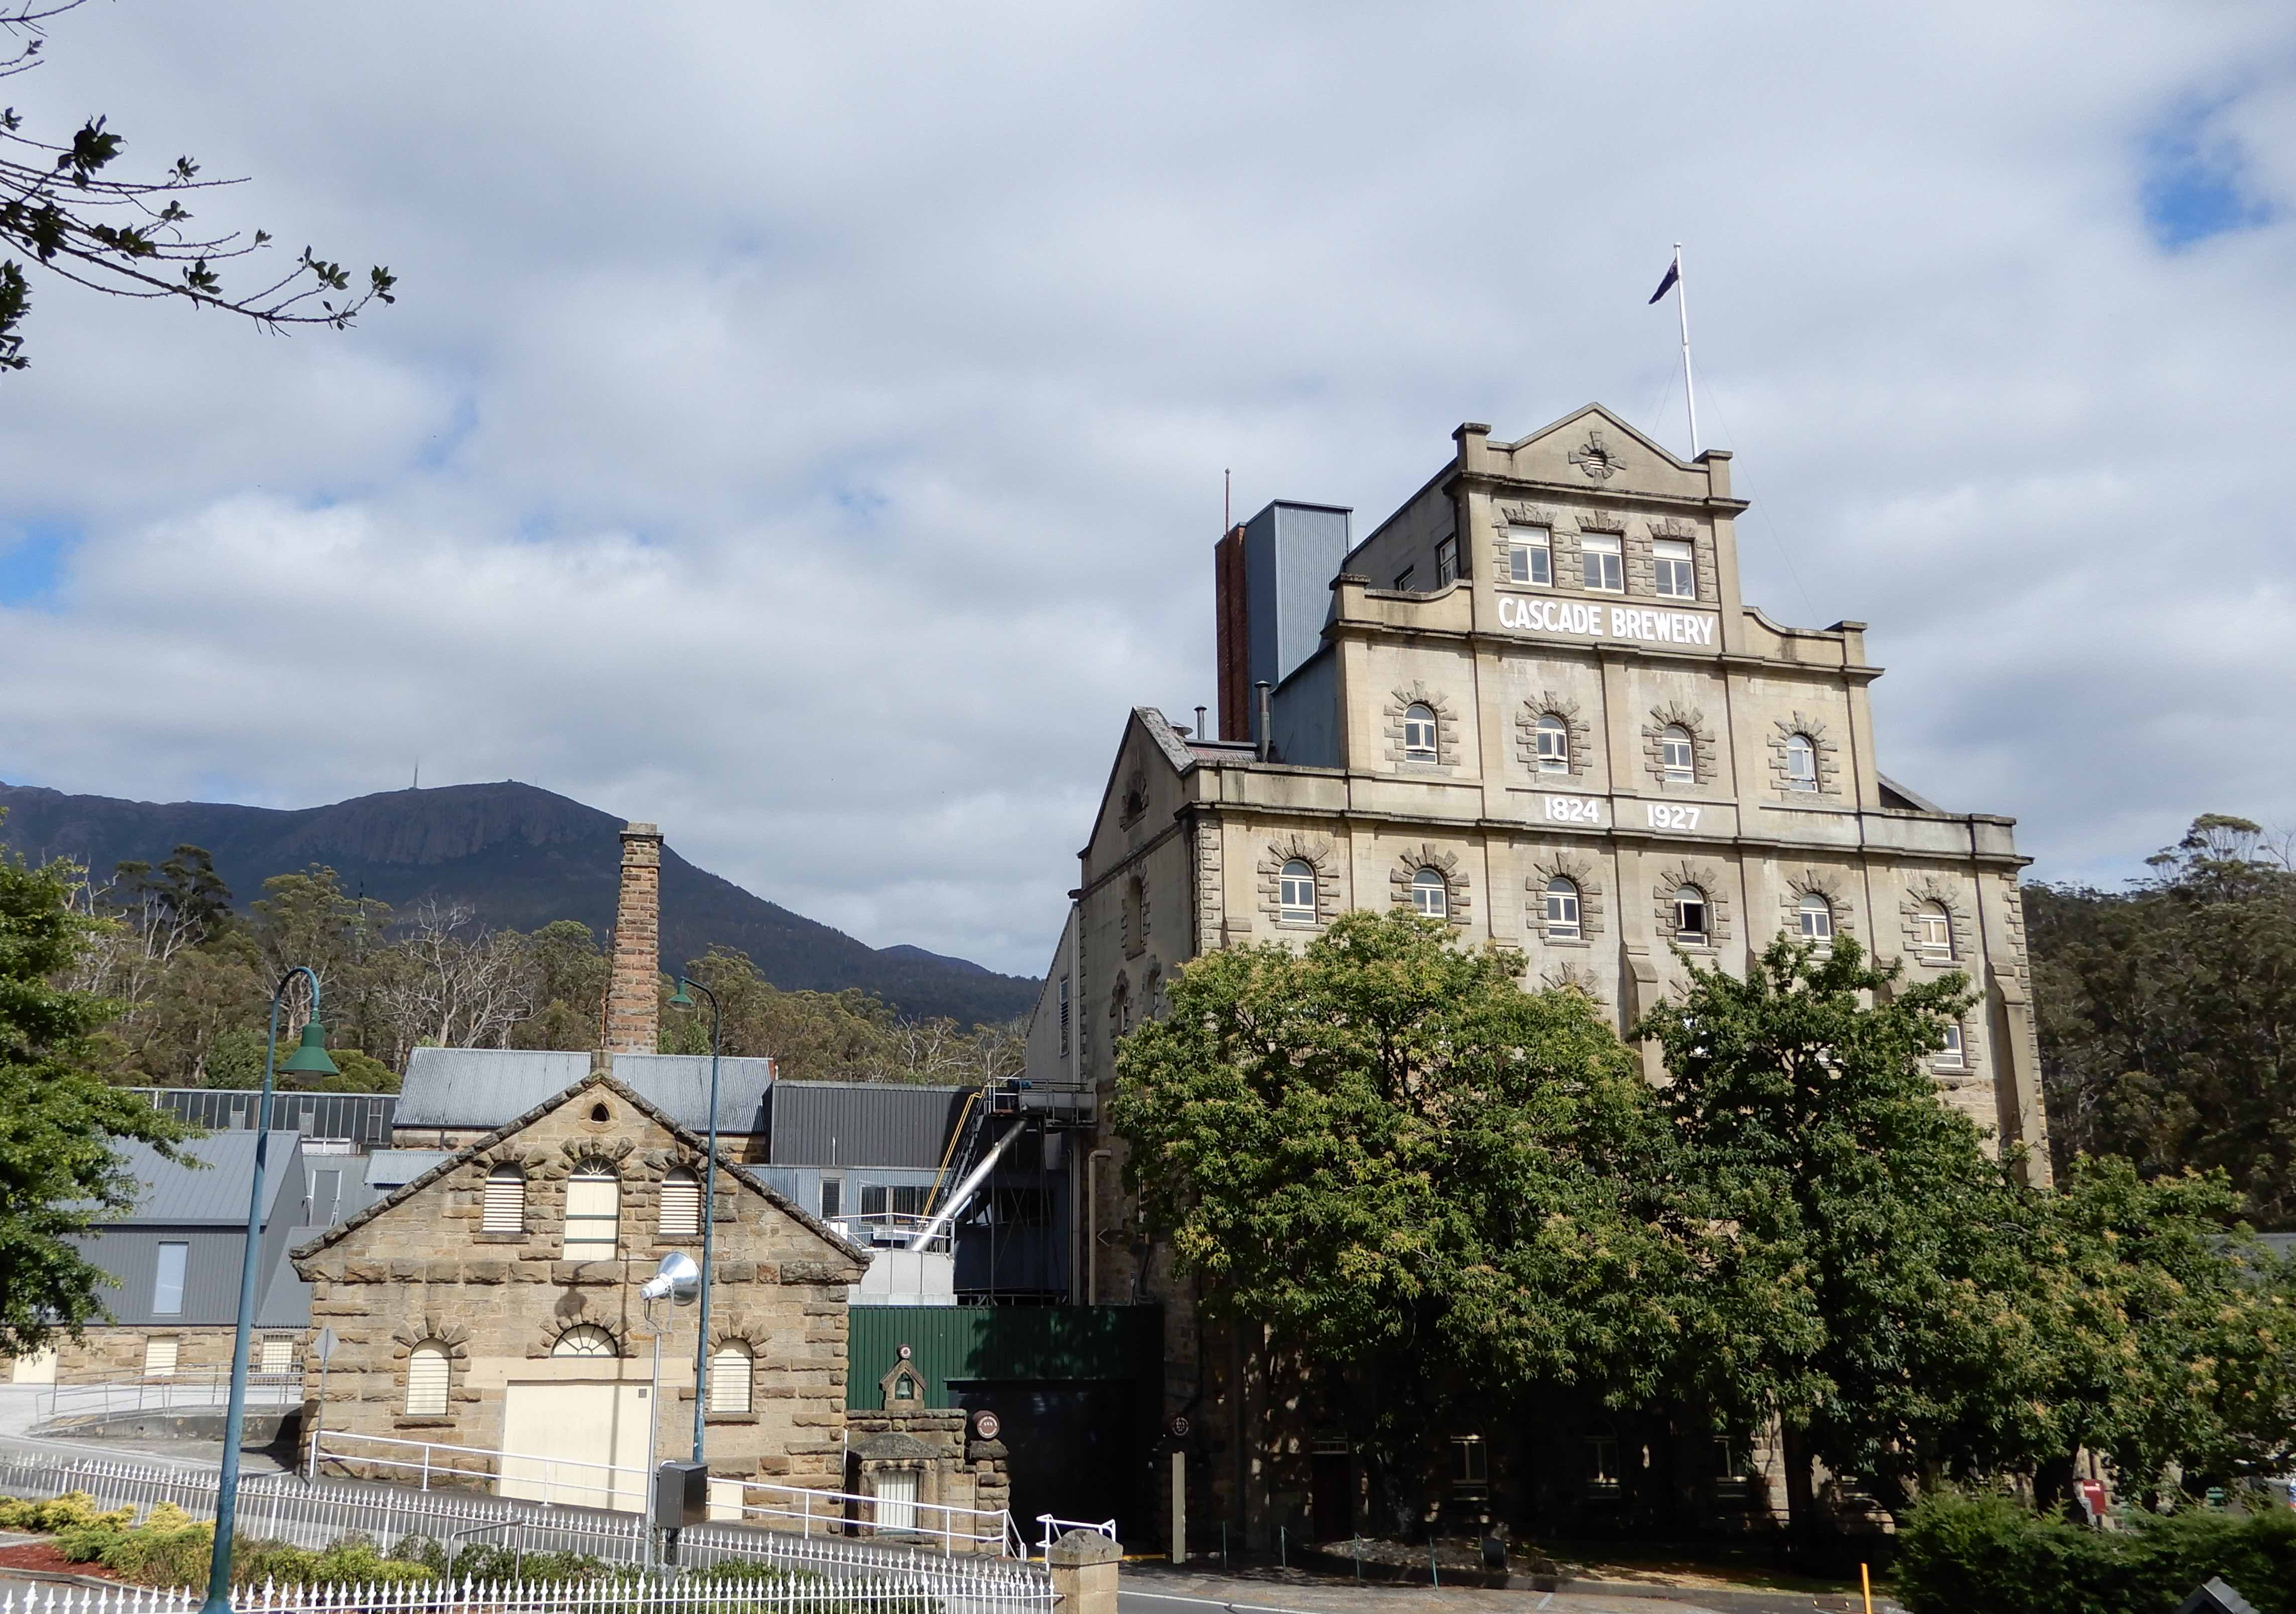 1.Cascade Brewery